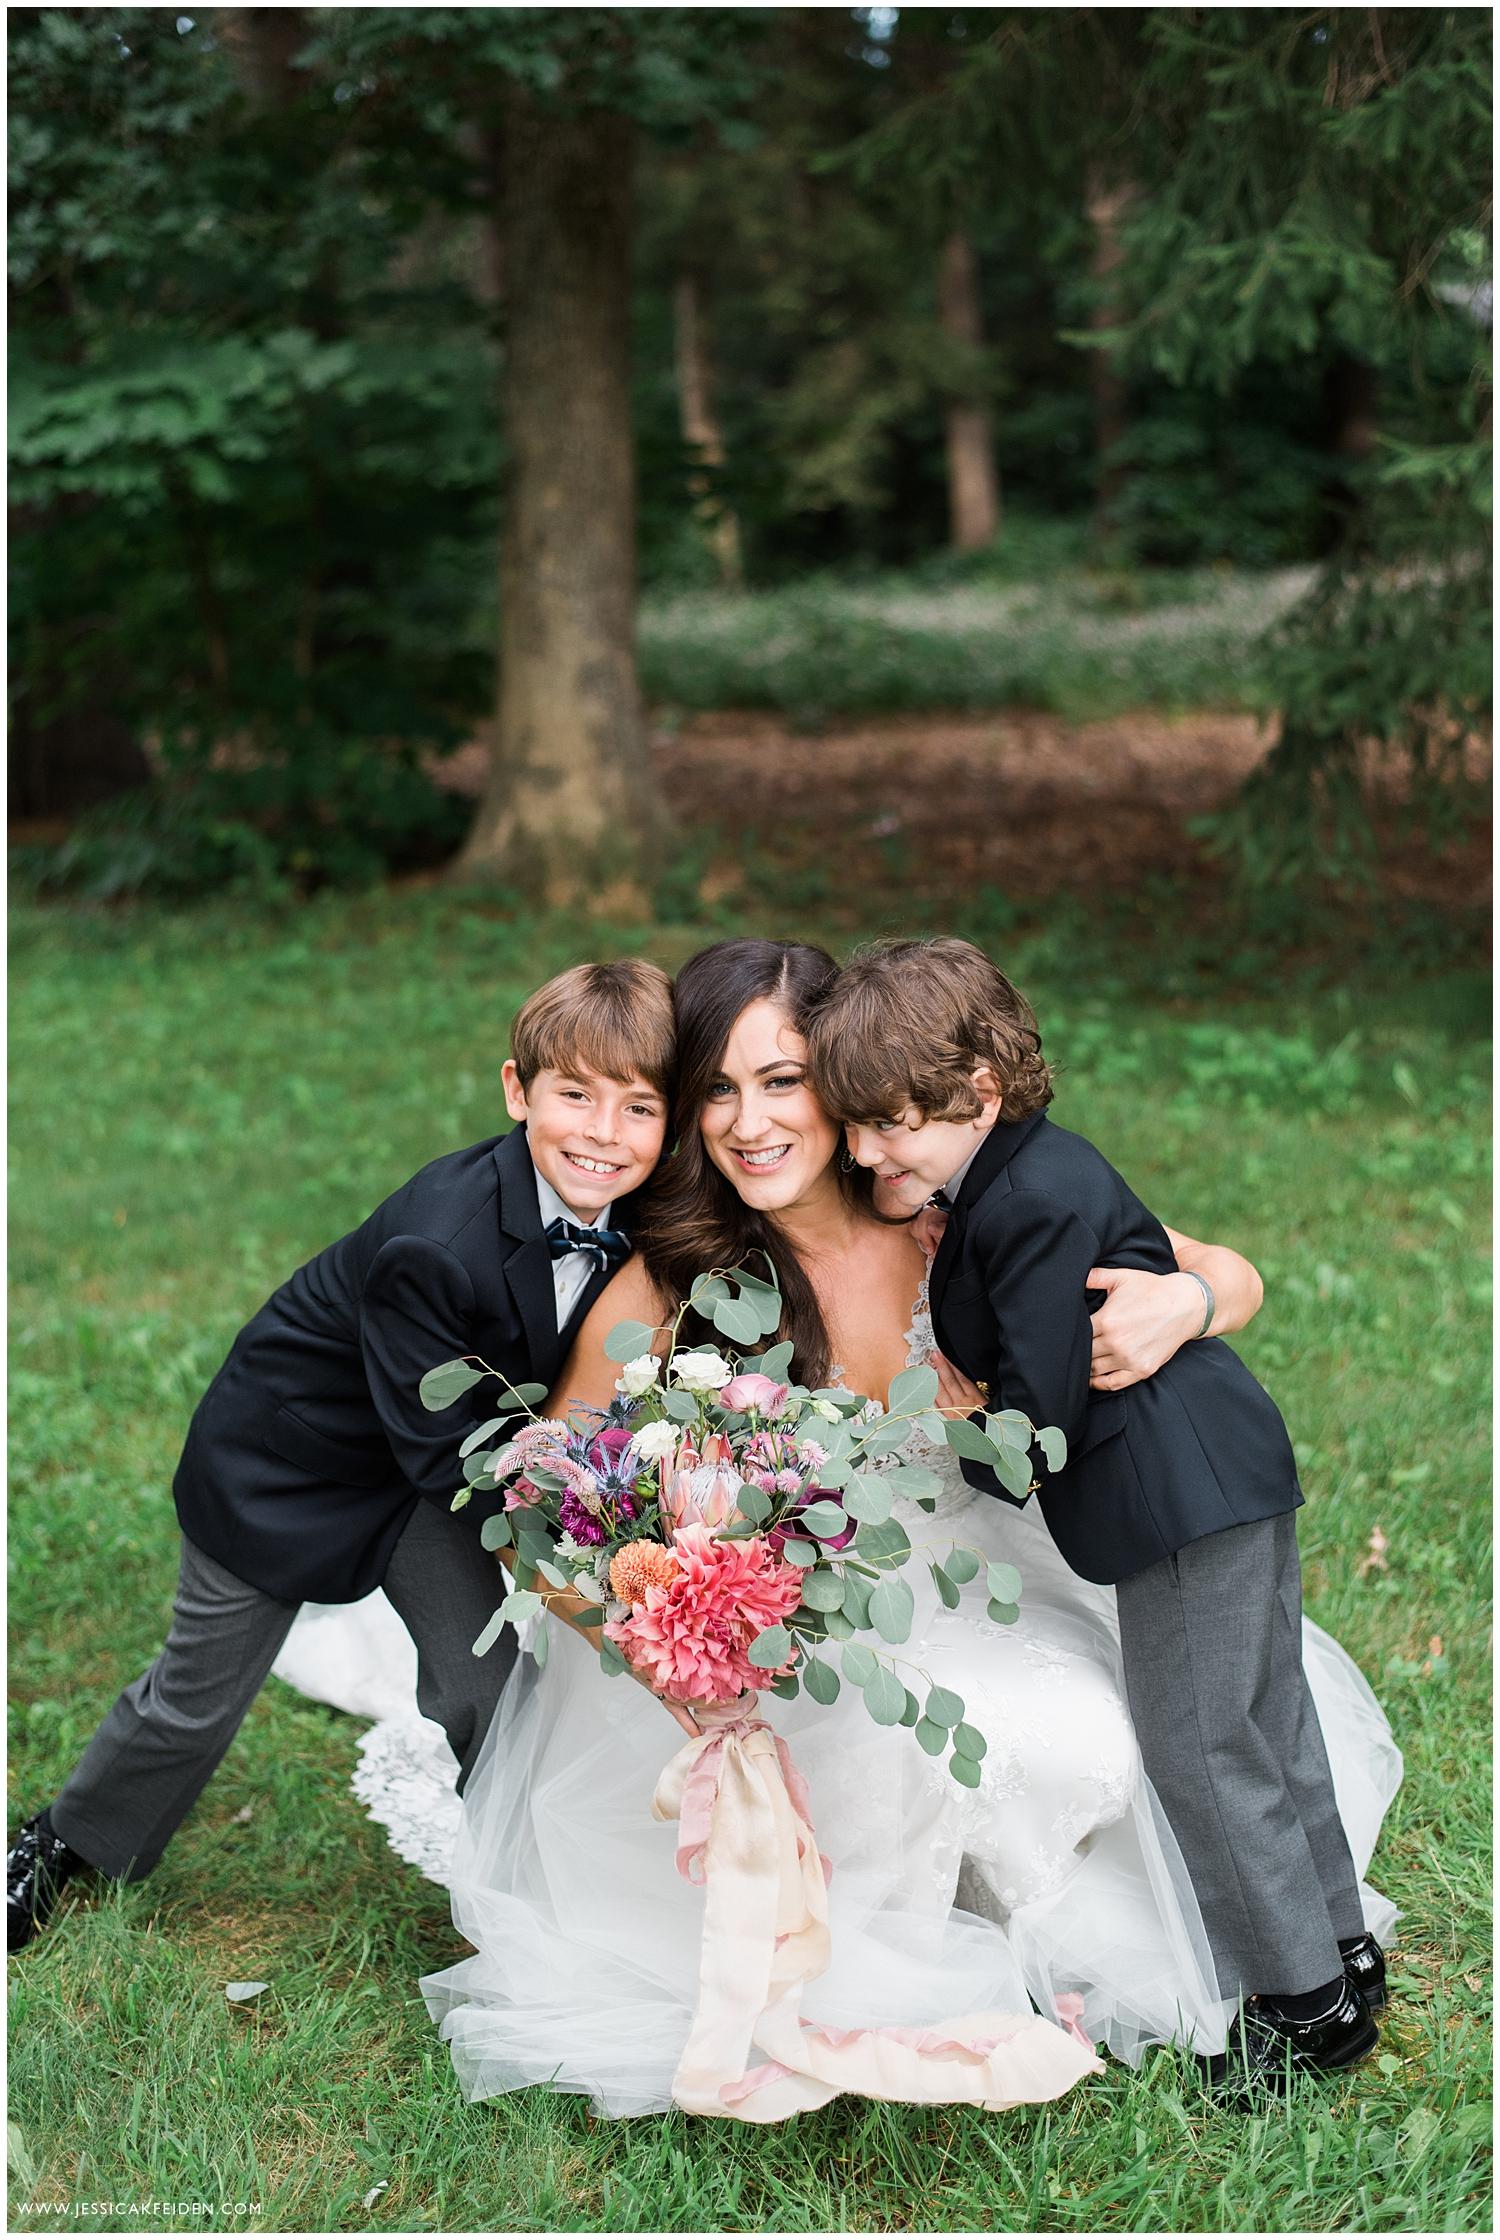 Jessica K Feiden Photography_Gardens at Elm Bank Wedding_0014.jpg